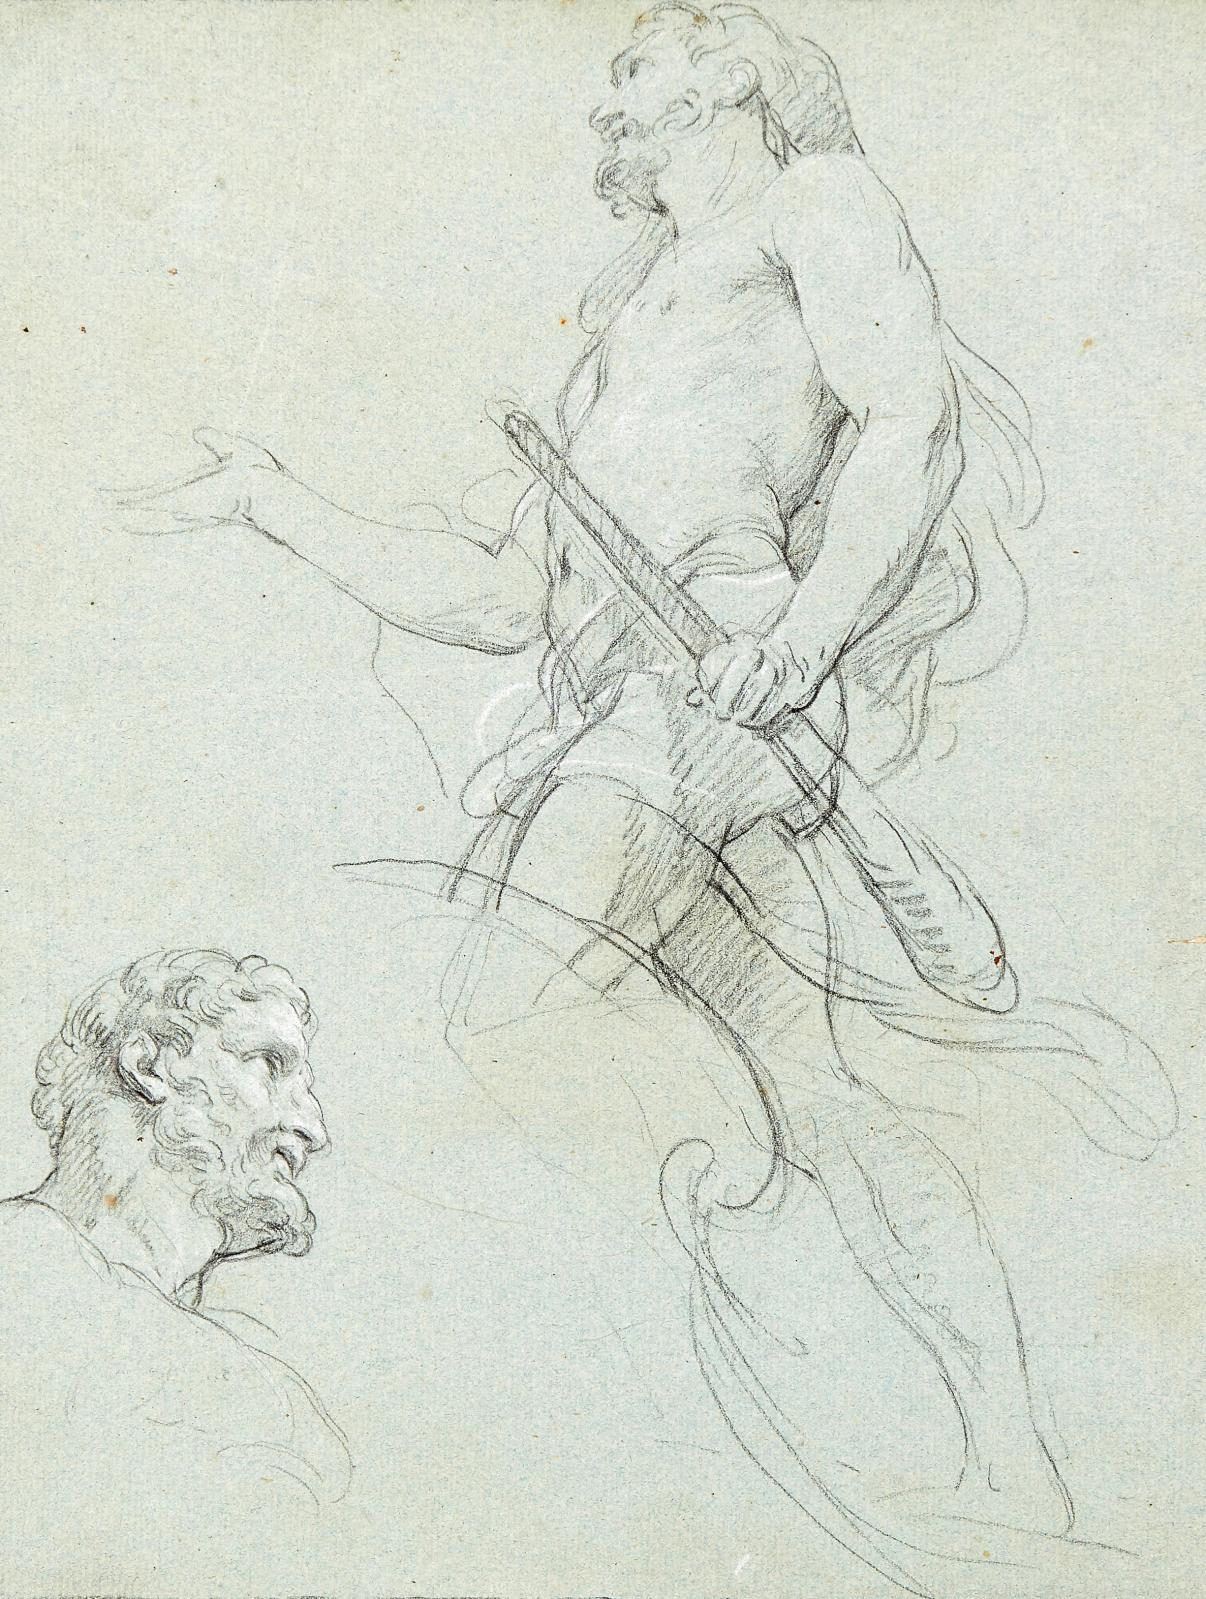 François Lemoyne (1688-1737), Study for a figure of Hercules, black and white chalk on blue paper, 31.5 x 24 cm.Result: €66,040